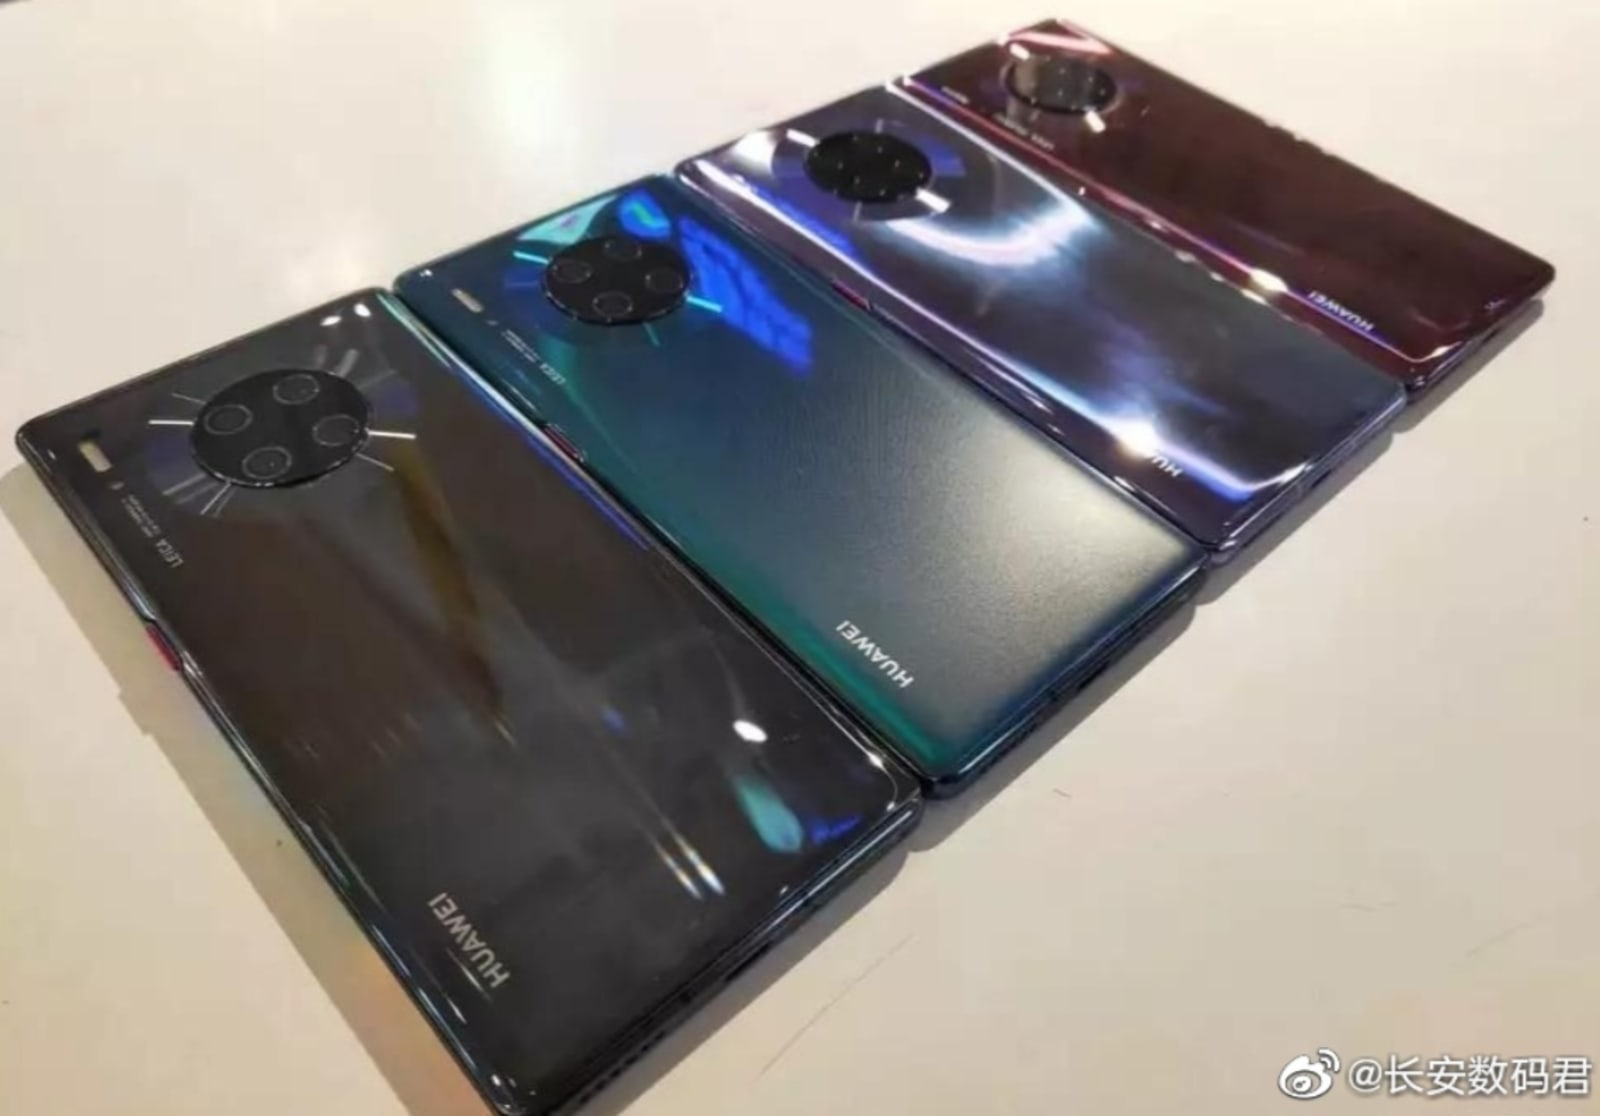 Huge leak spoils Huawei's Mate 30 event